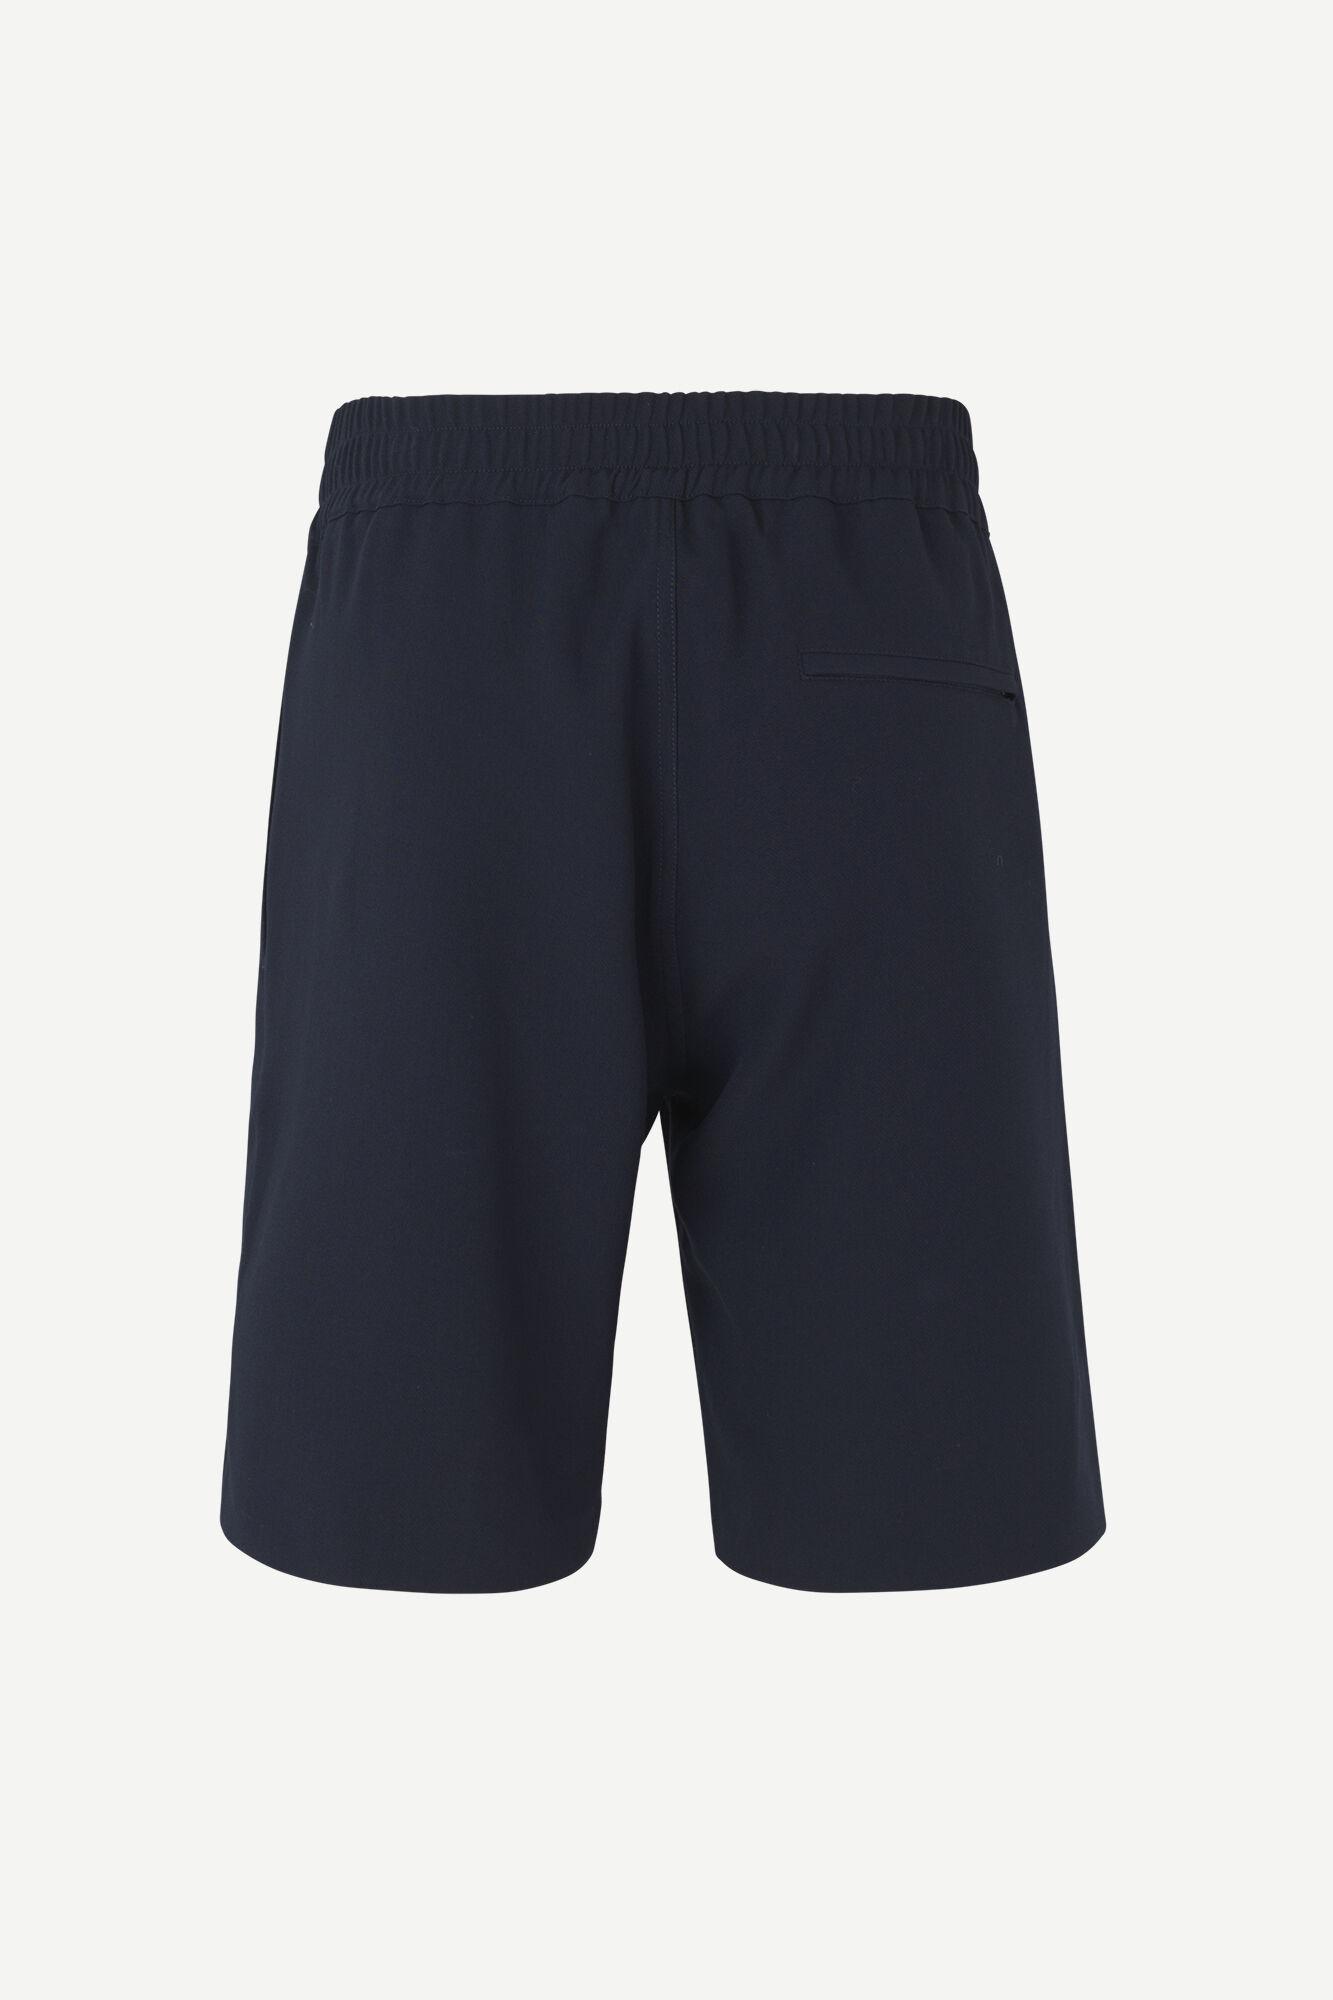 Samsoe Samsoe Smith Summer Shorts Navy Blue-2